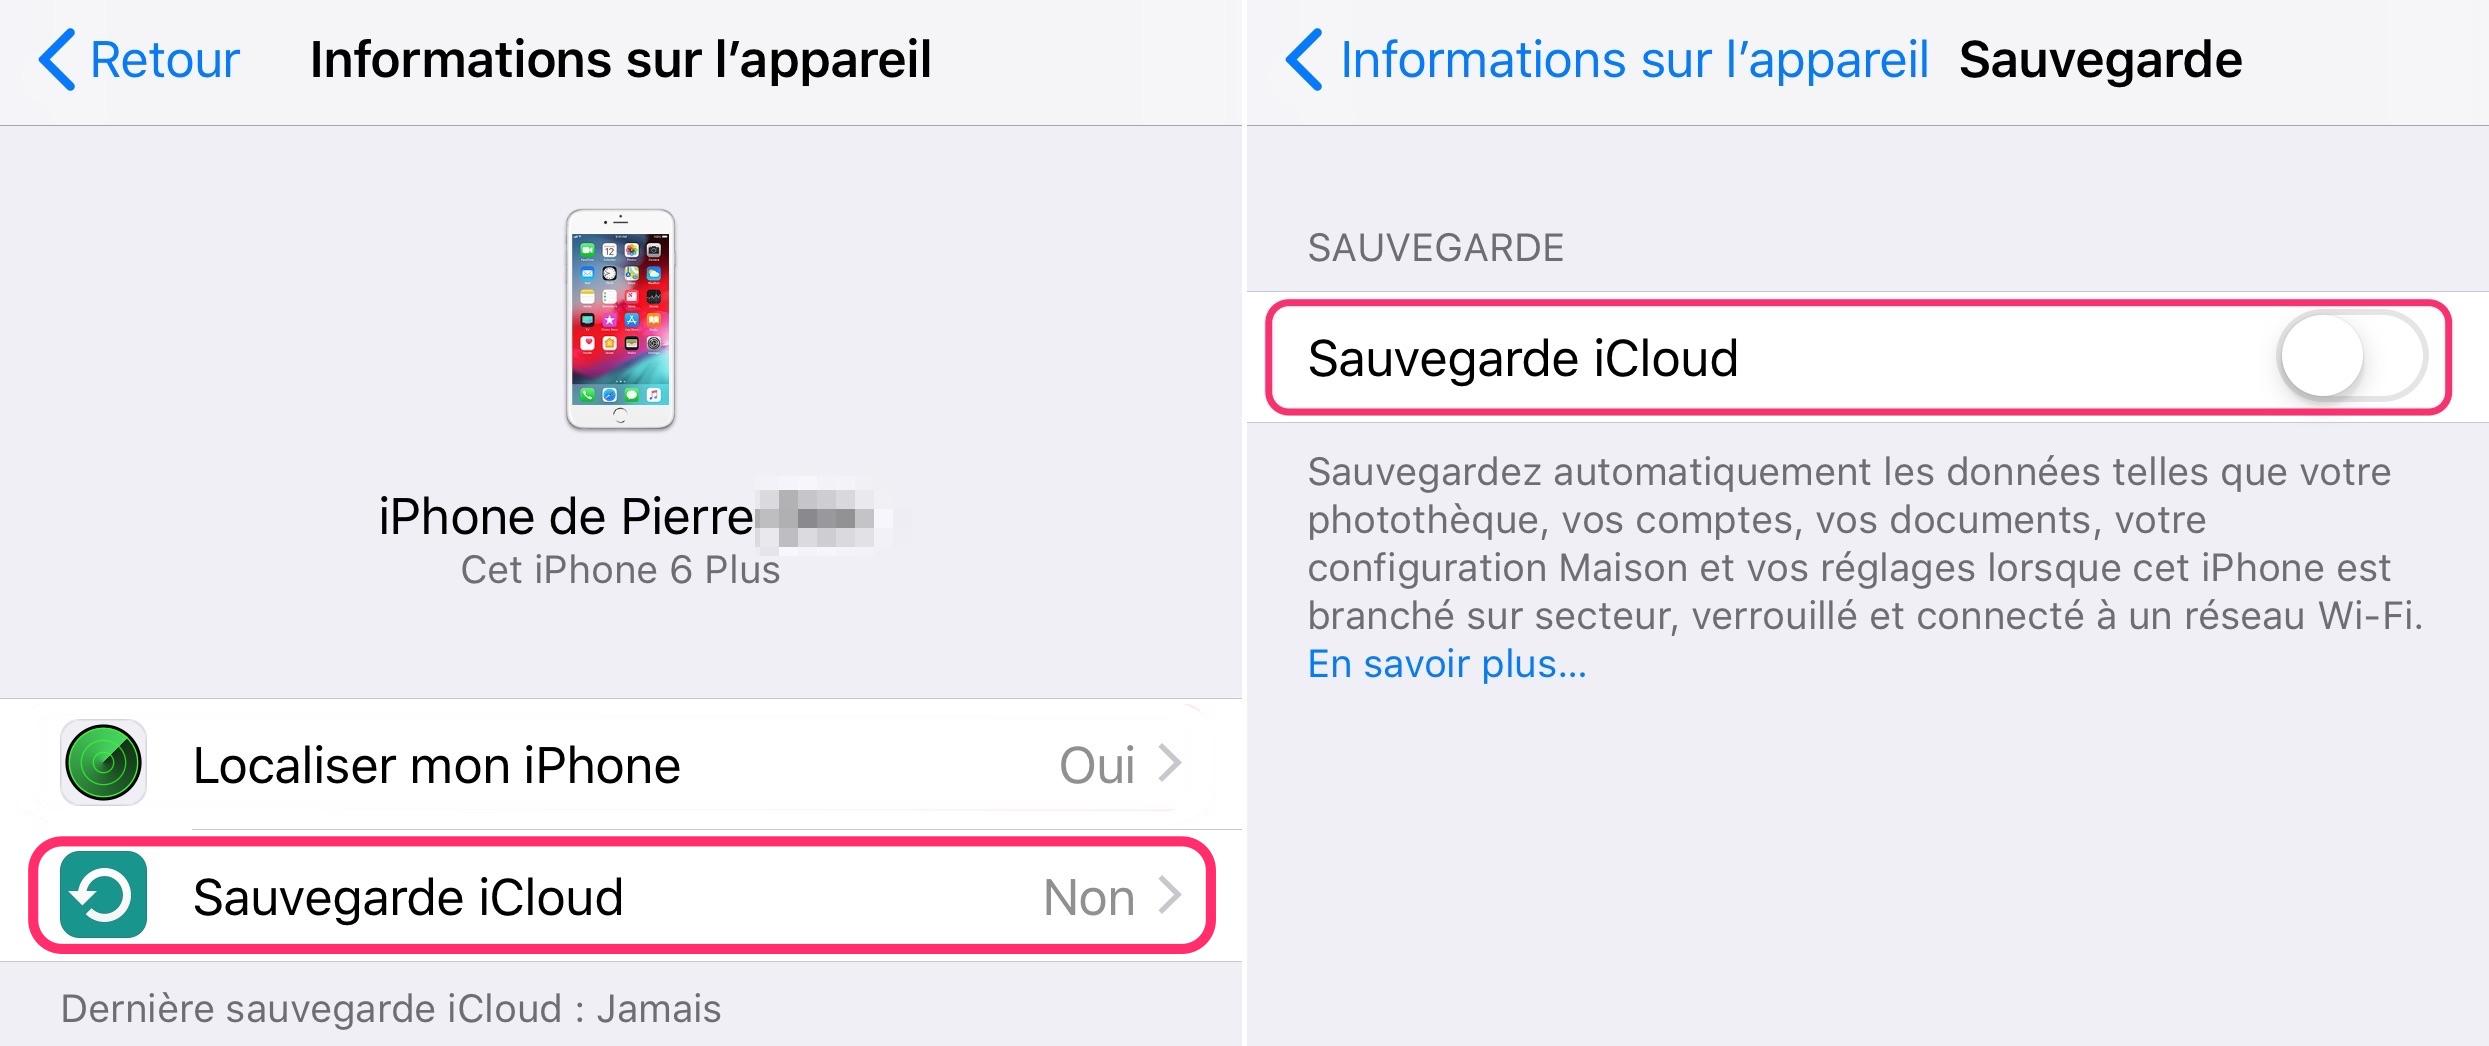 iOS sauvegarder son iPhone sur iCloud